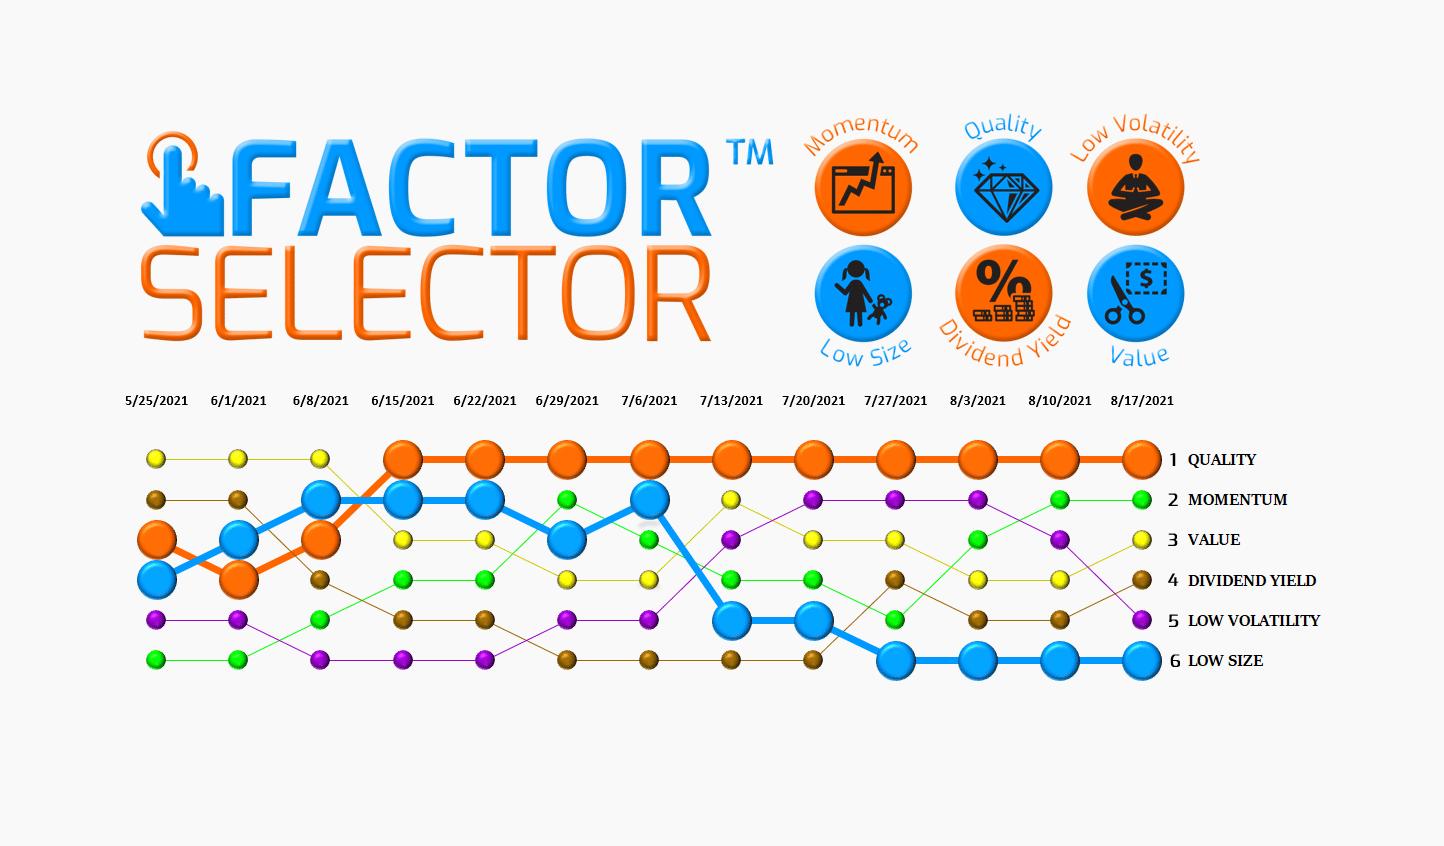 Factor Selector™  – 08/18/21 via @https://www.pinterest.com/market_scholars